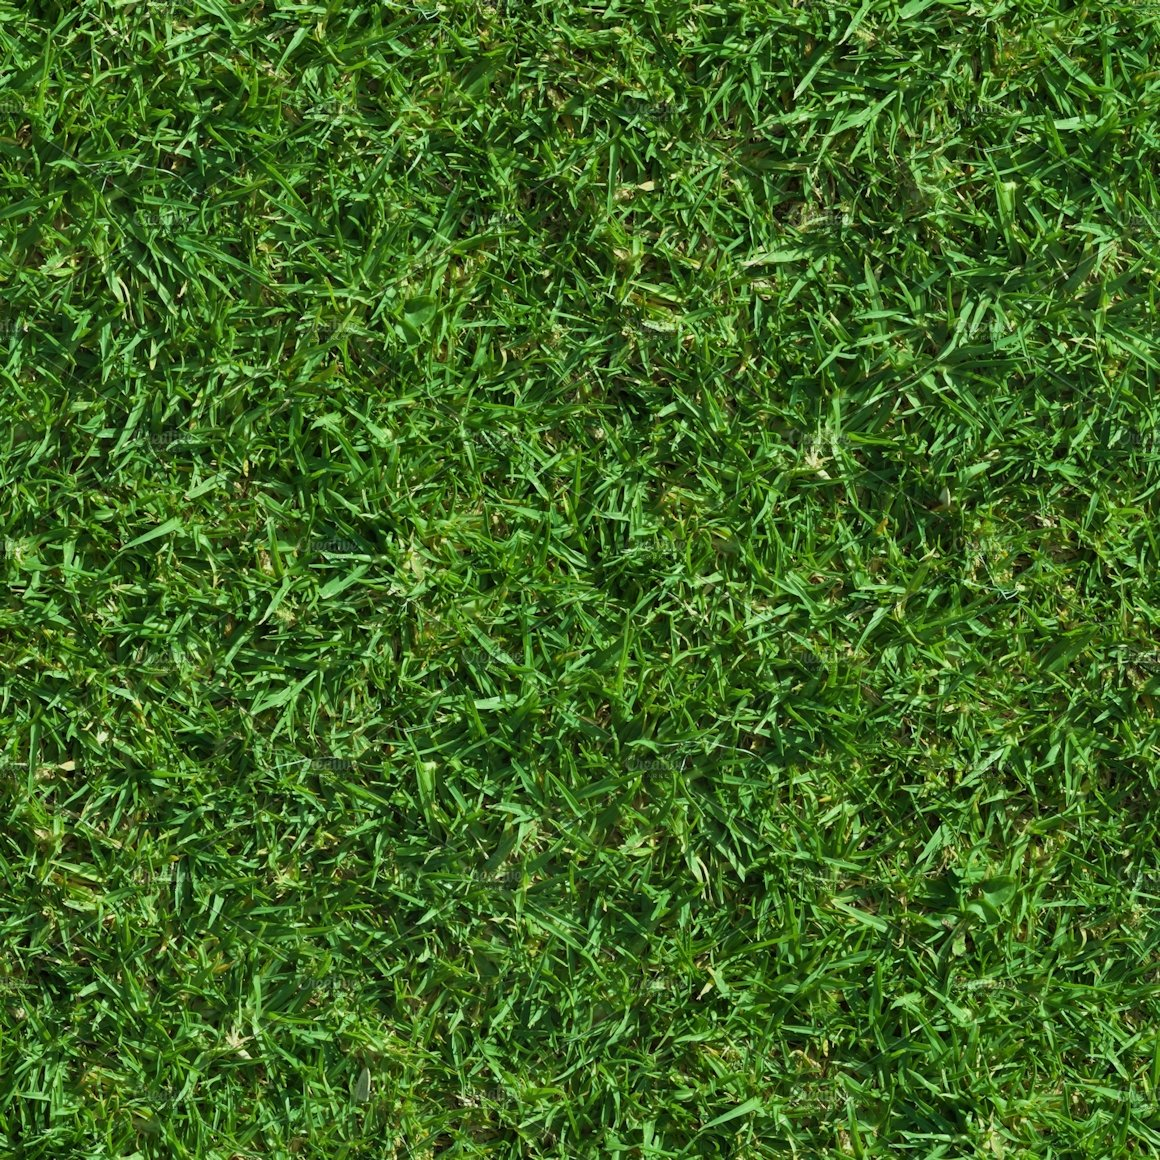 Lush Seamless Grass Texture Textures Creative Market